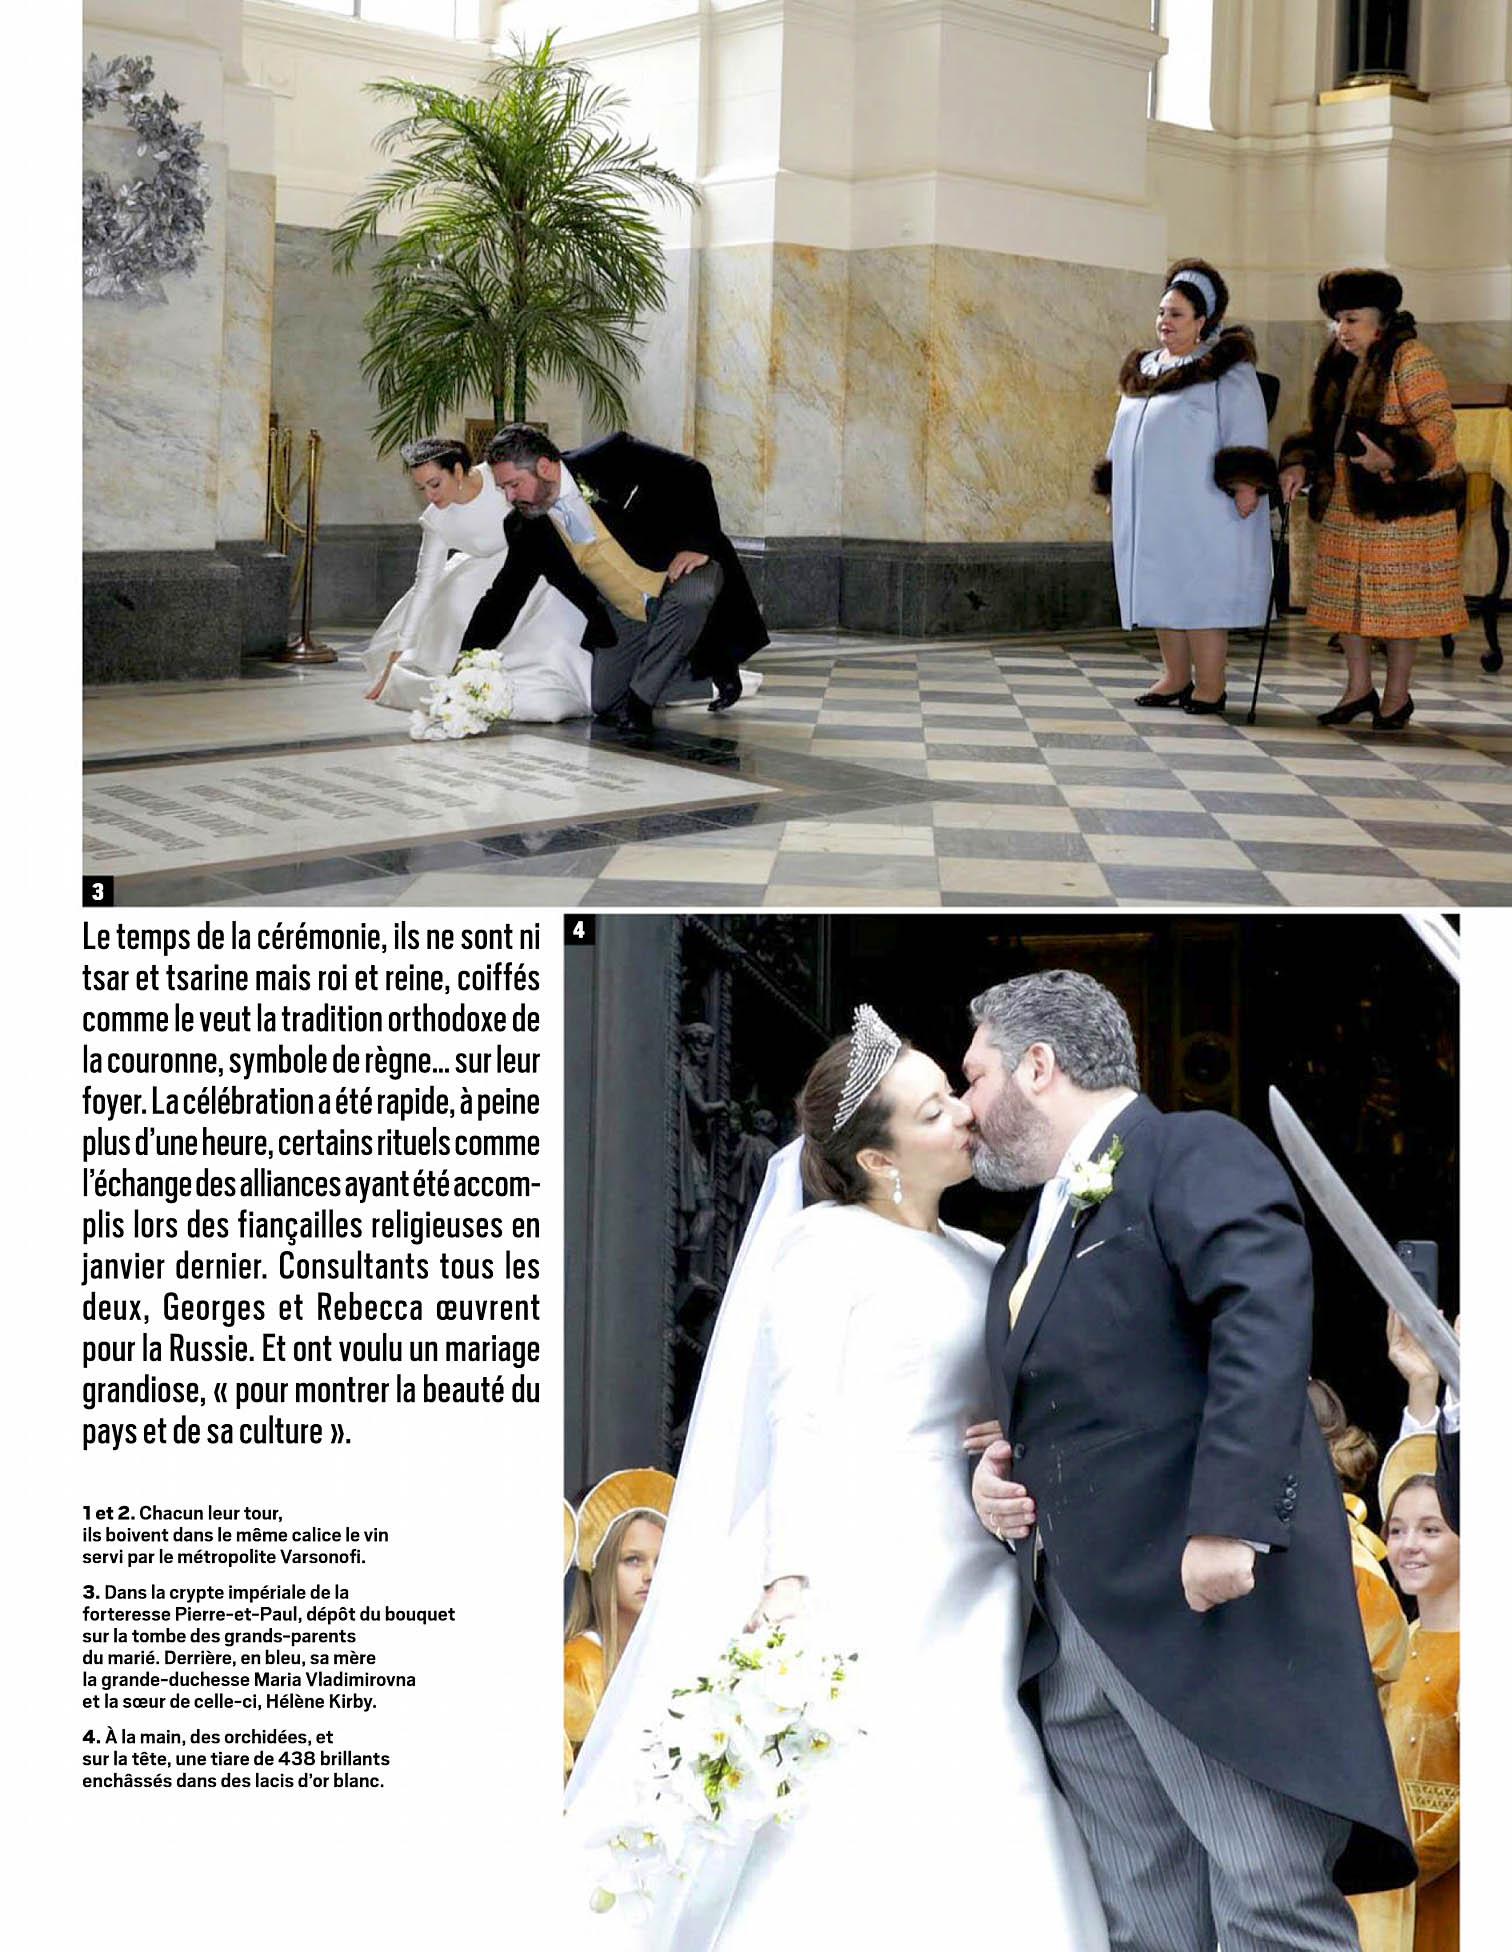 Paris Match 211007 Rus Royal 03.jpg